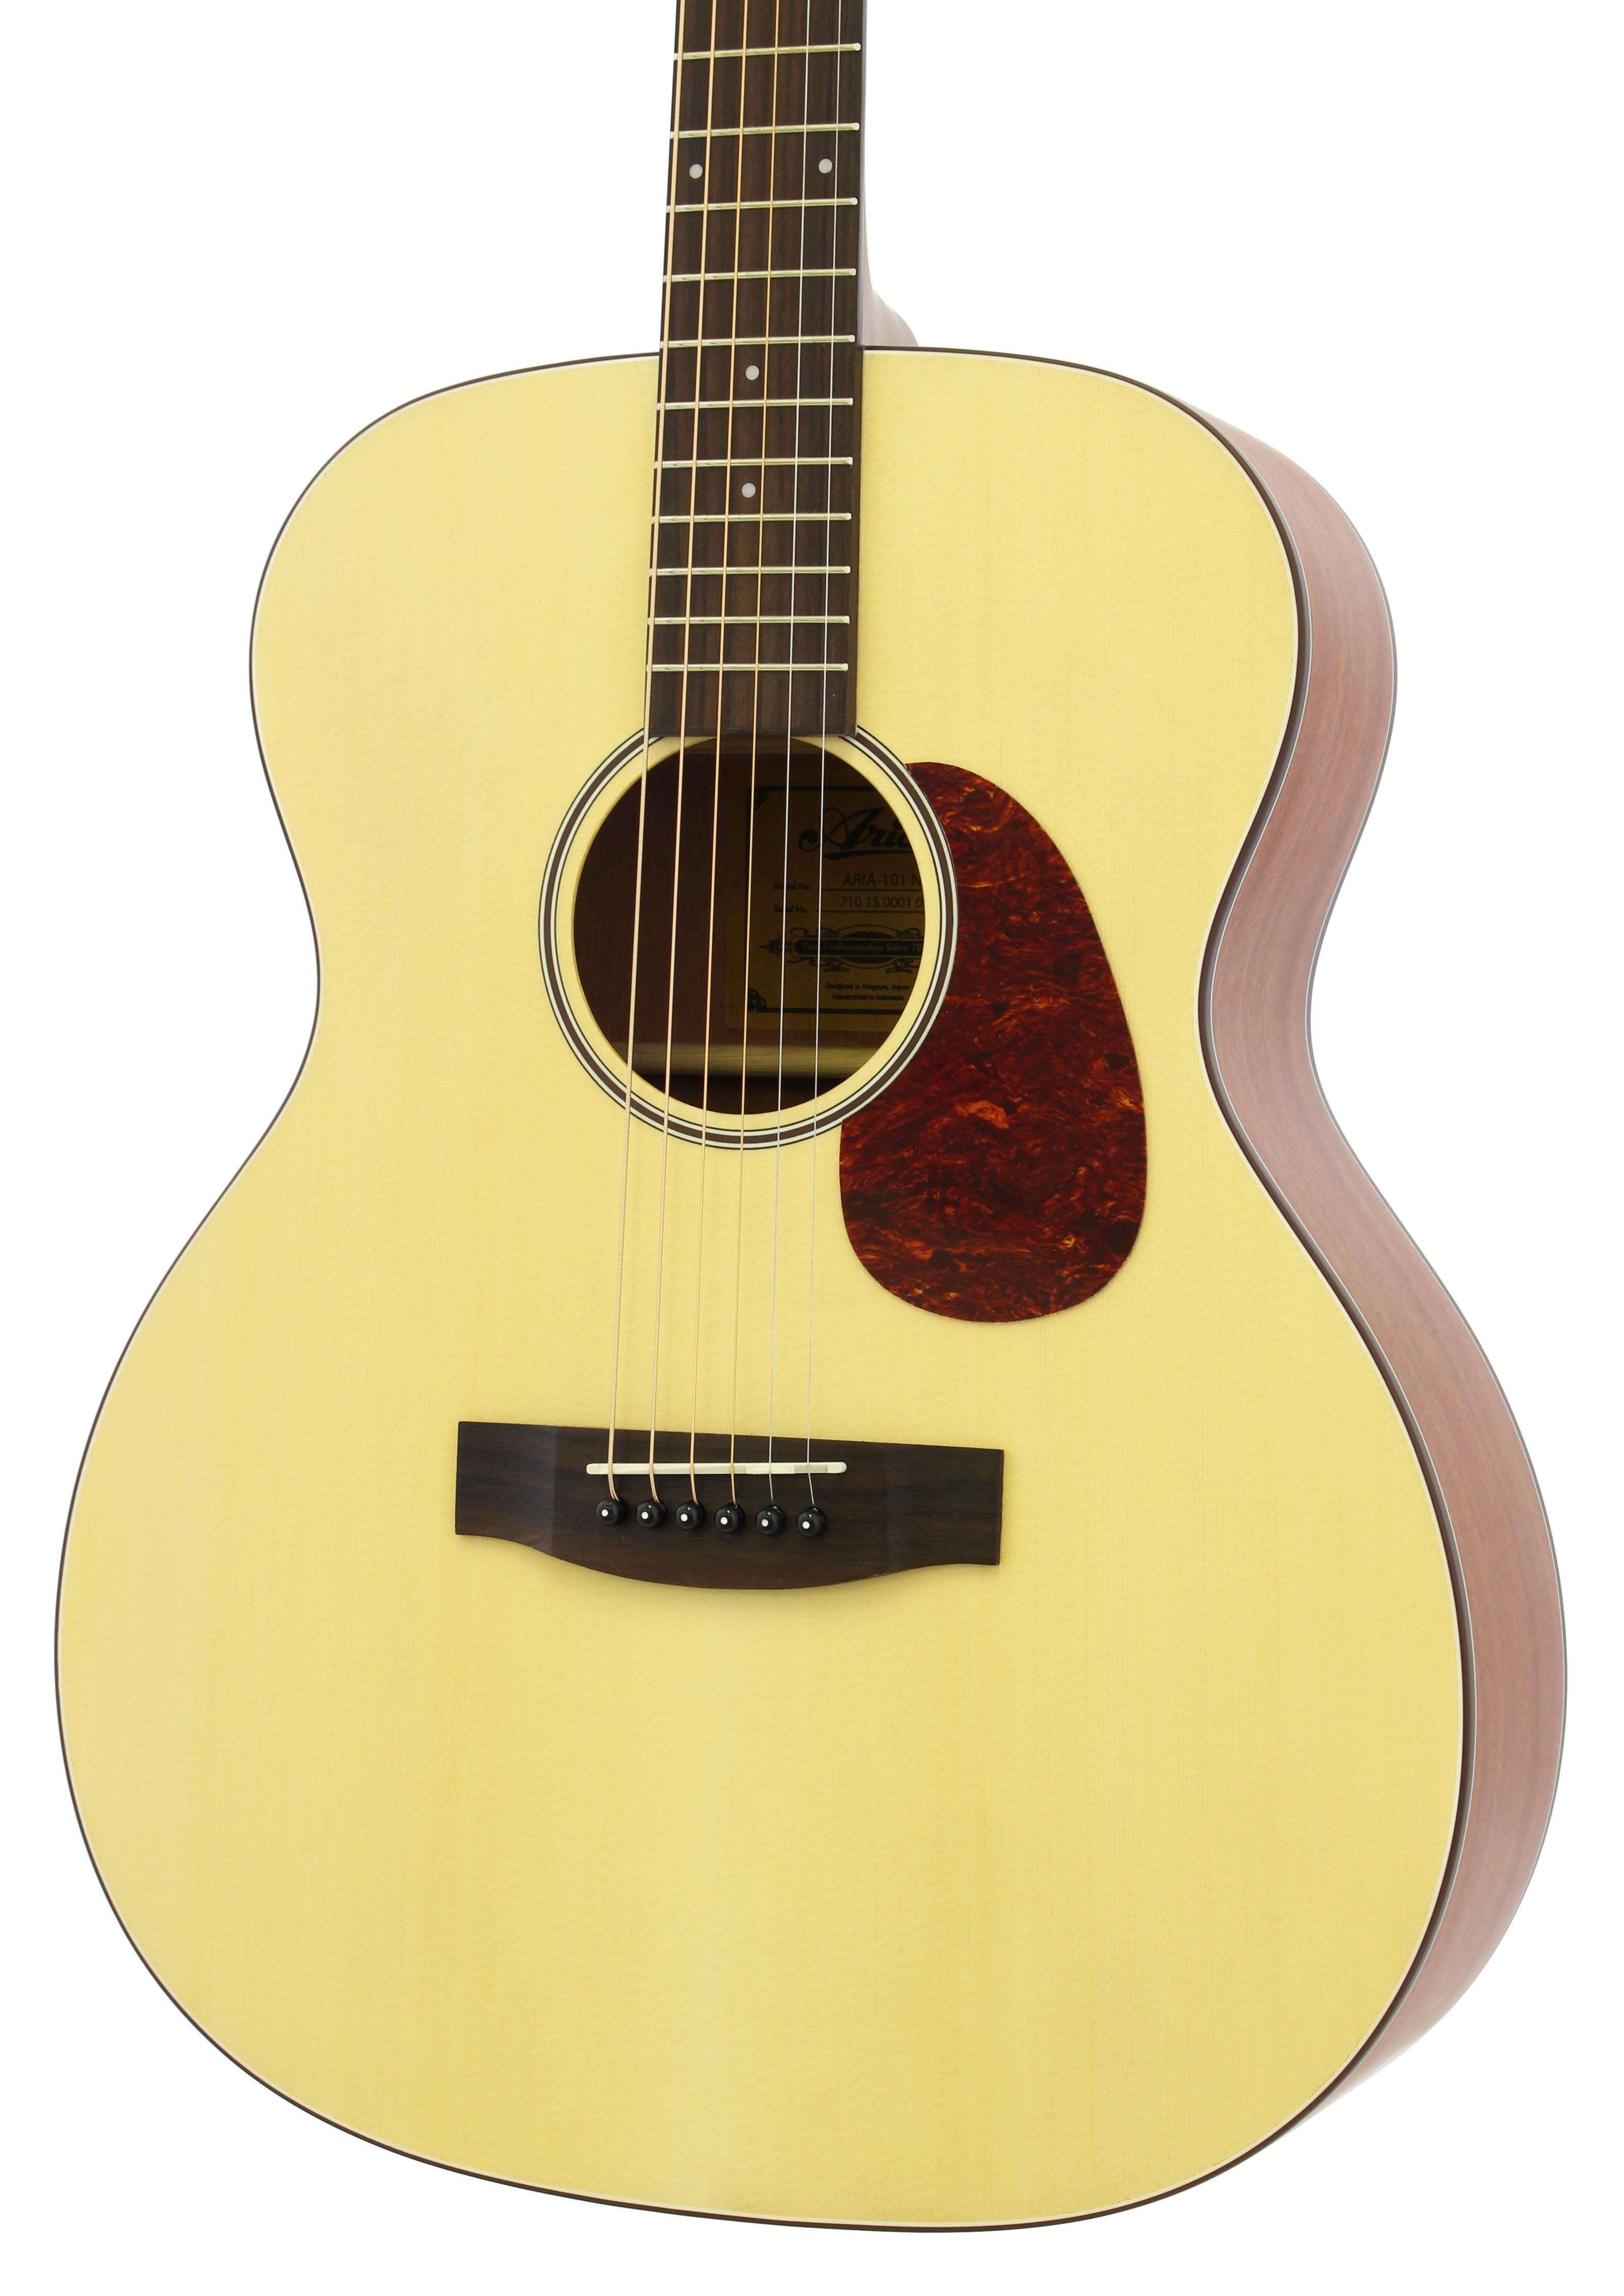 aria 101 orchestra shape acoustic guitar in matte natural. Black Bedroom Furniture Sets. Home Design Ideas